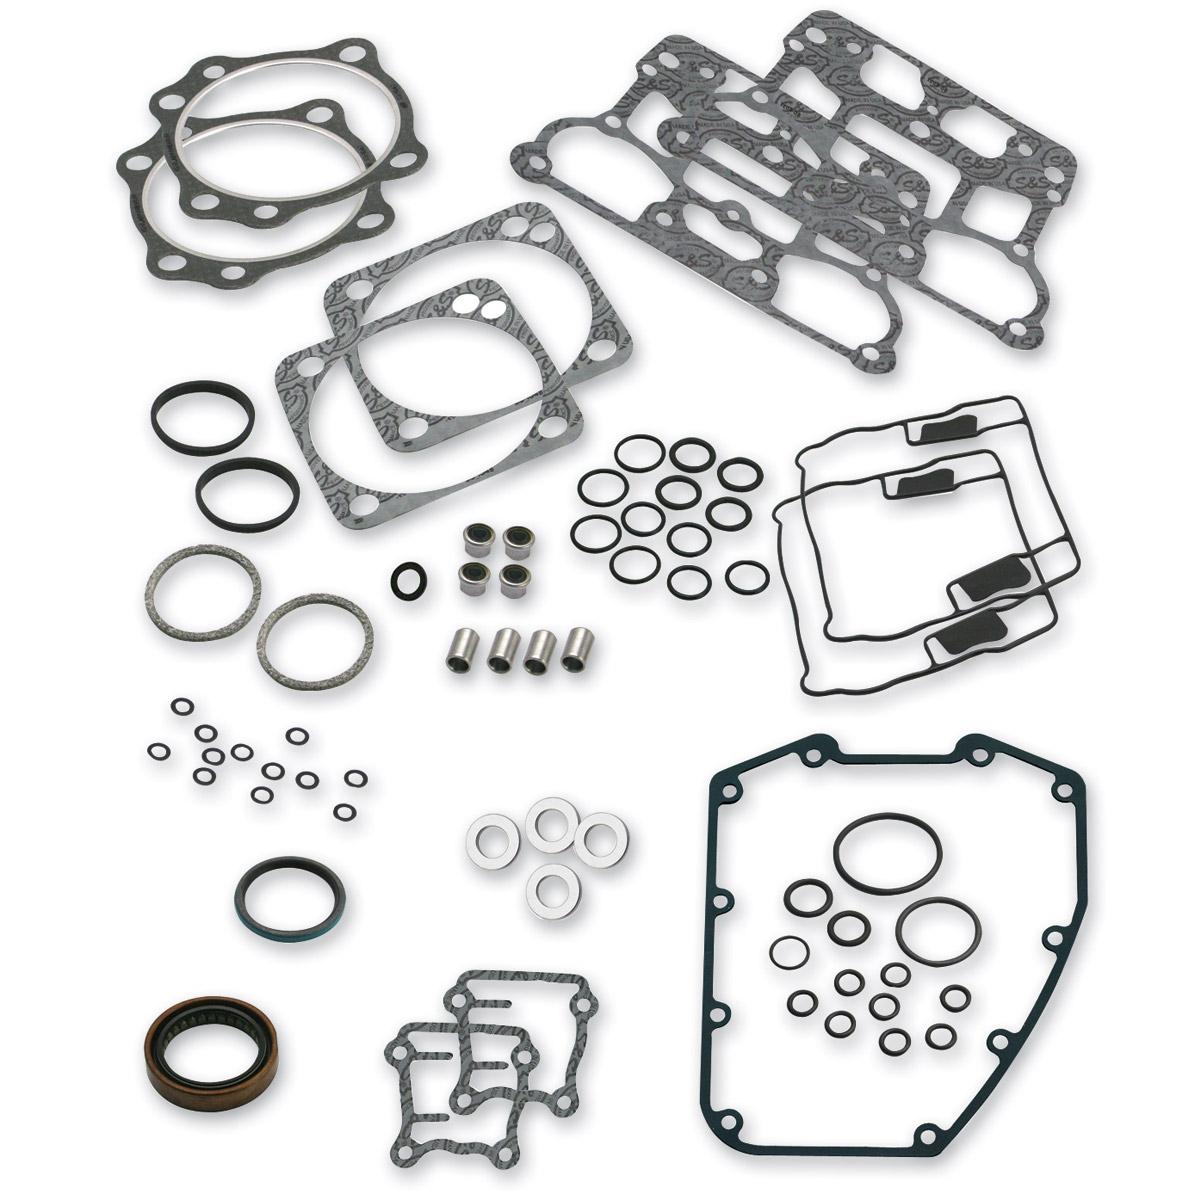 S Amp S Cycle T Series Engine Rebuild Gasket Set